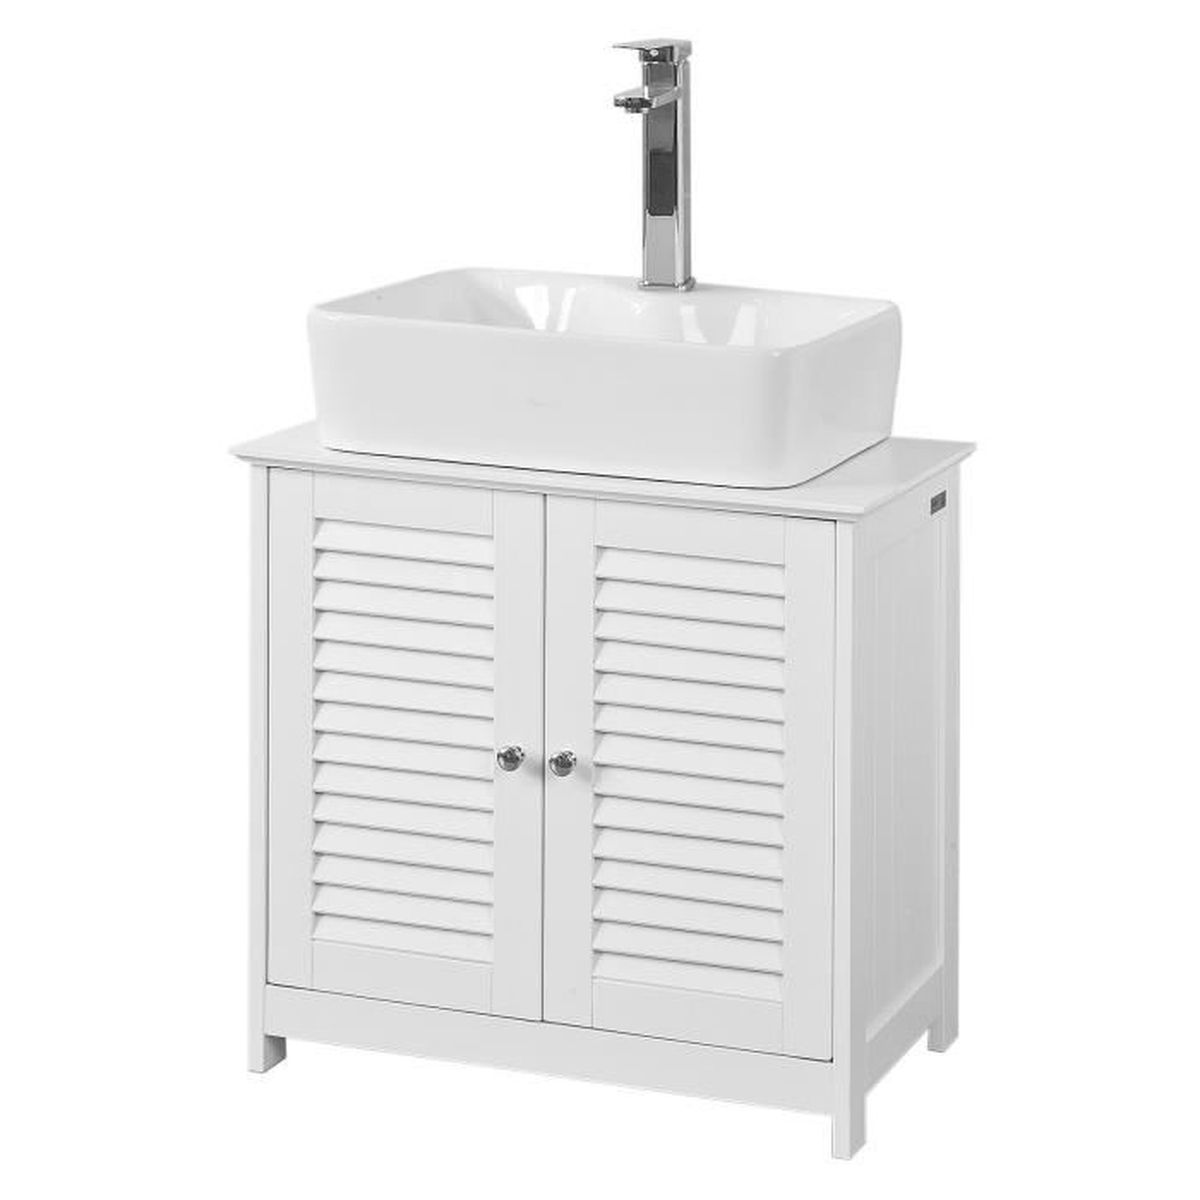 Espace Entre 2 Vasques sobuy® frg237-w meuble sous-lavabo meuble de salle de bain